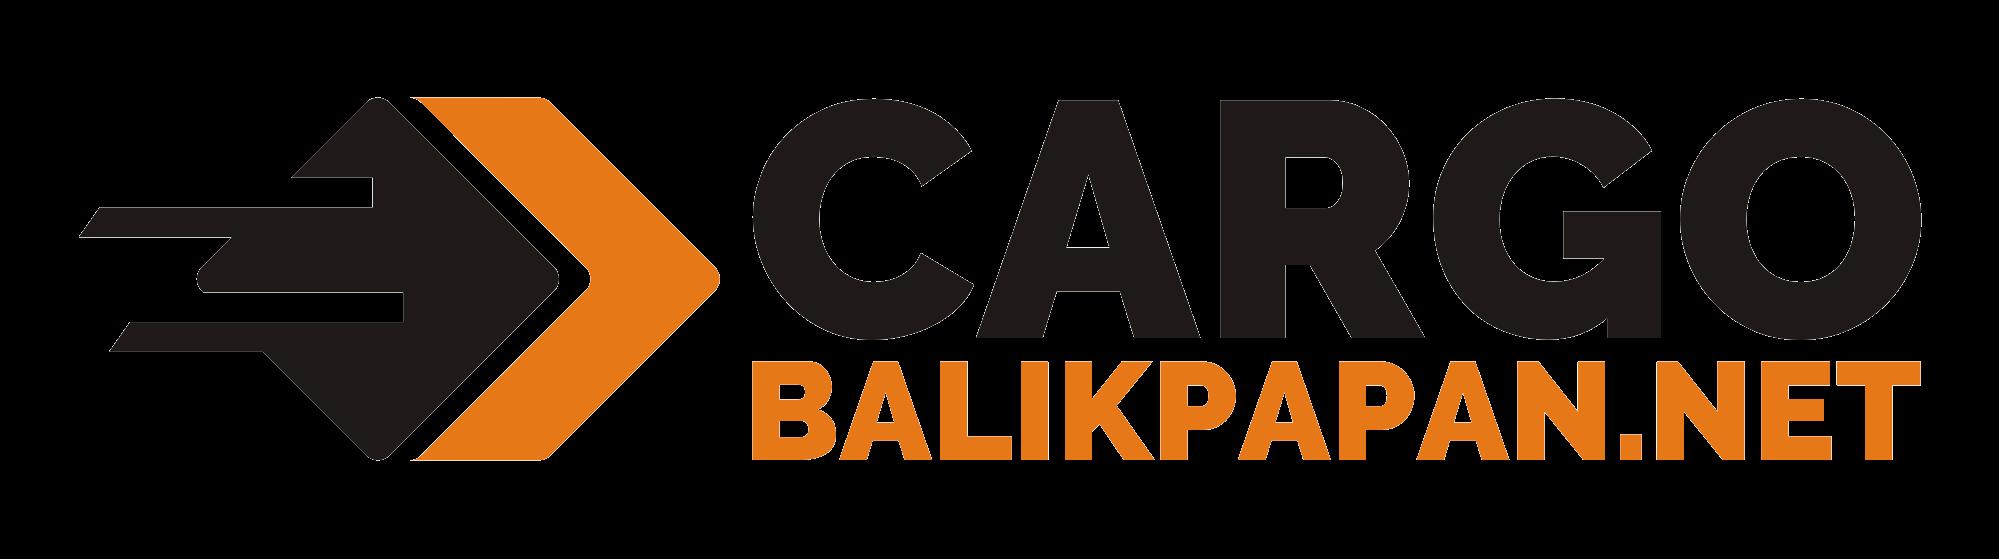 Cargo Balikpapan net